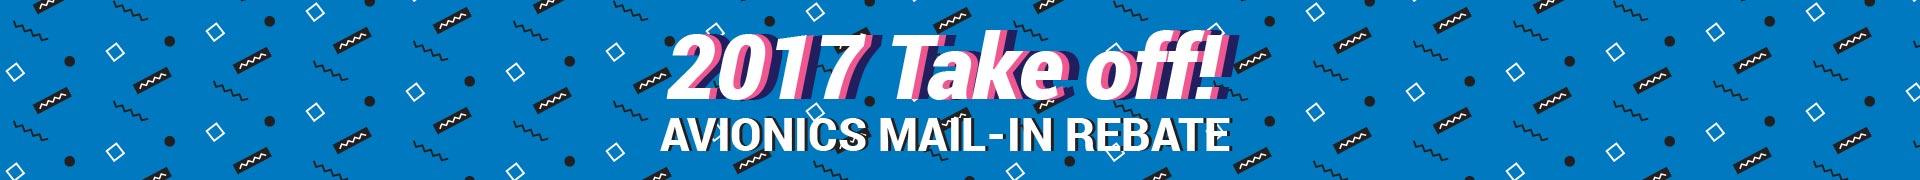 AvMap Avionics Mail-In rebate 2016